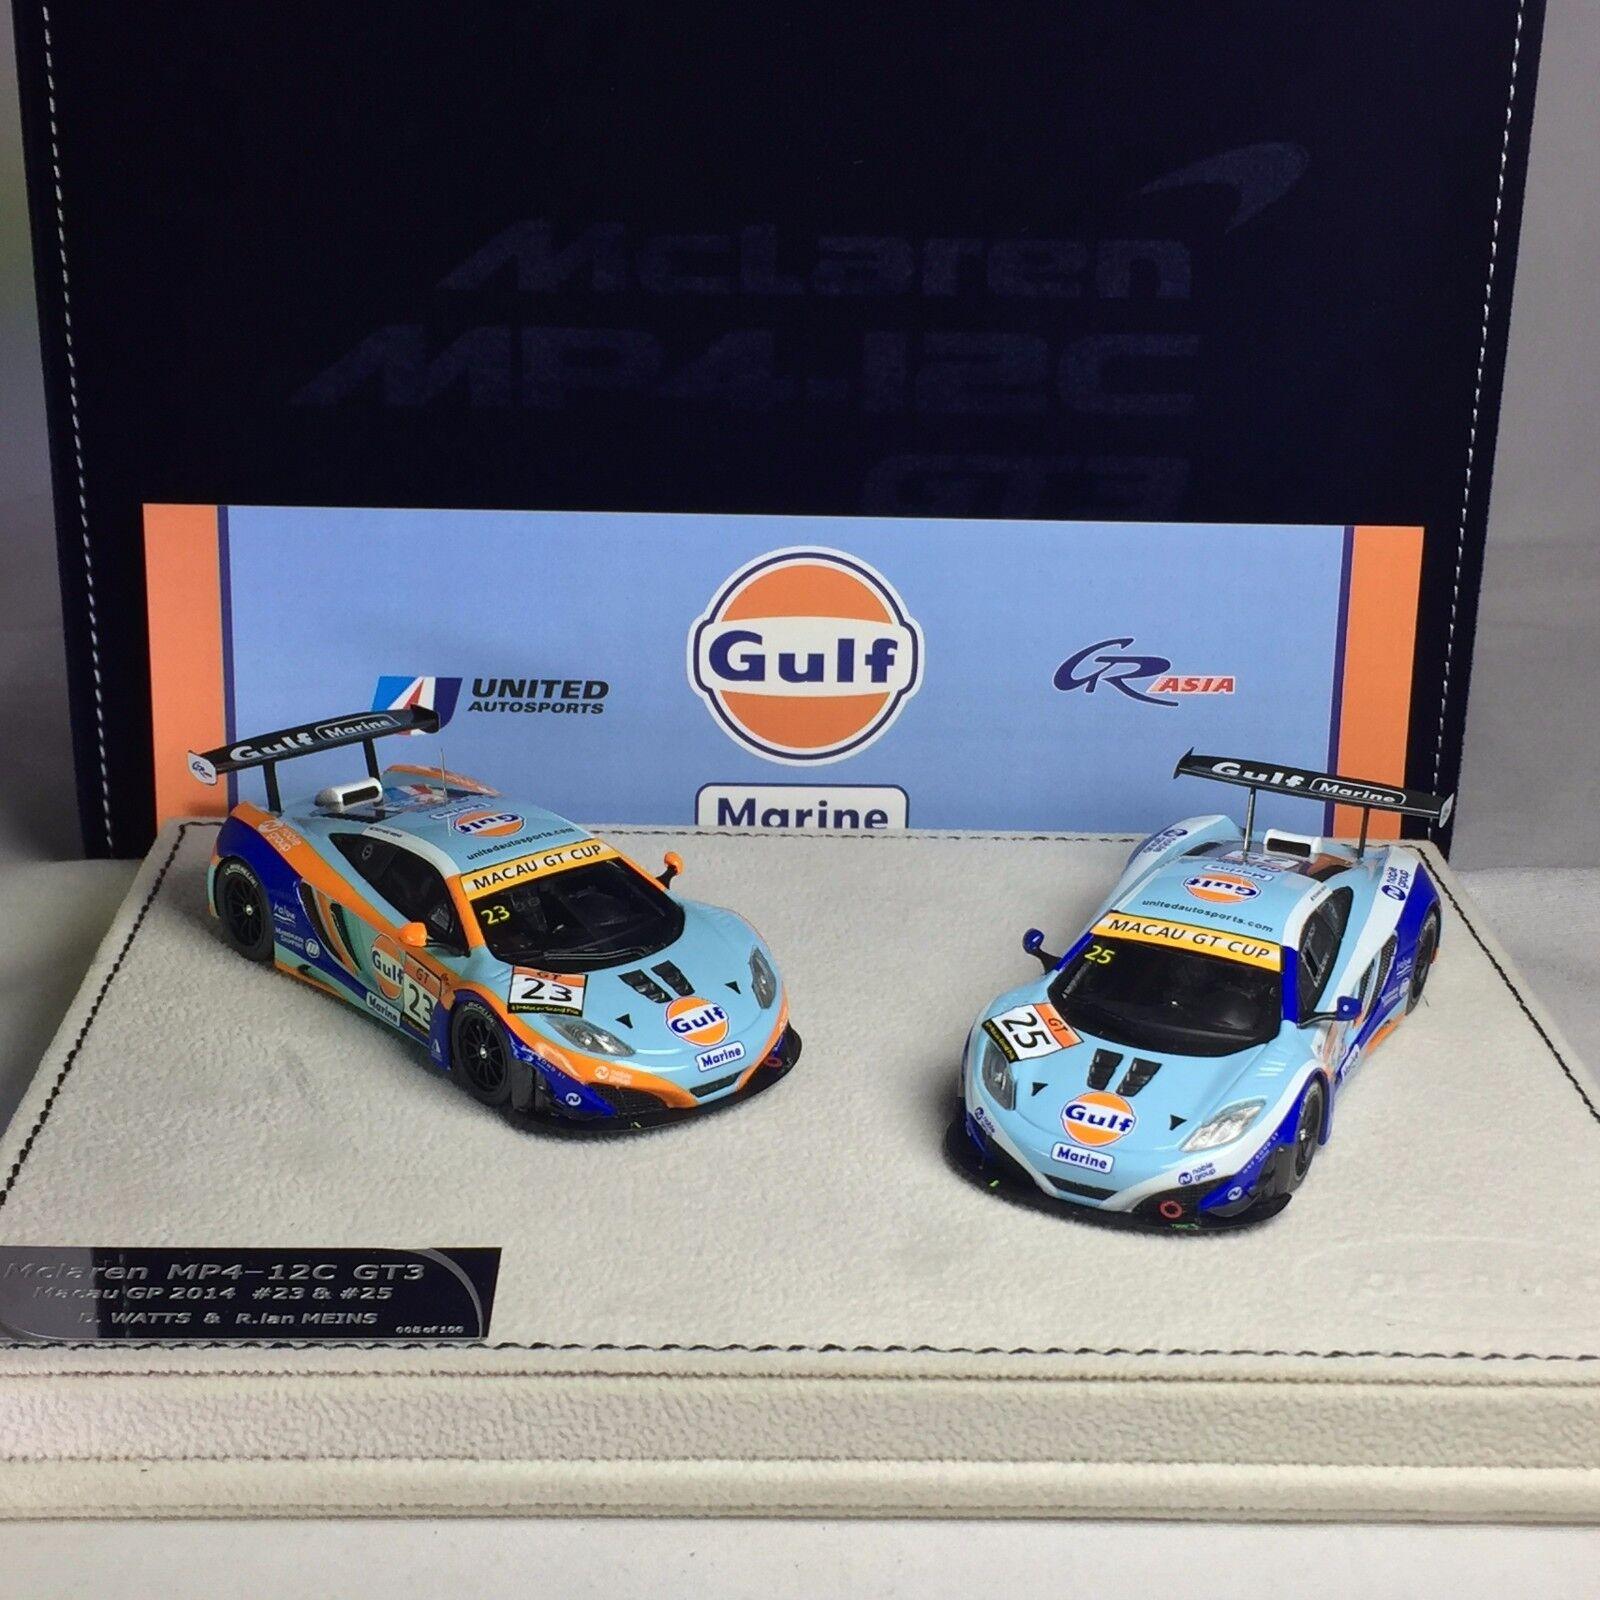 distribuzione globale 1 1 1 43 Peako Mclaren MP4-12C GT3 Macau GP 2014 Danny WATTS & R. Ian MEINS Set  grandi risparmi